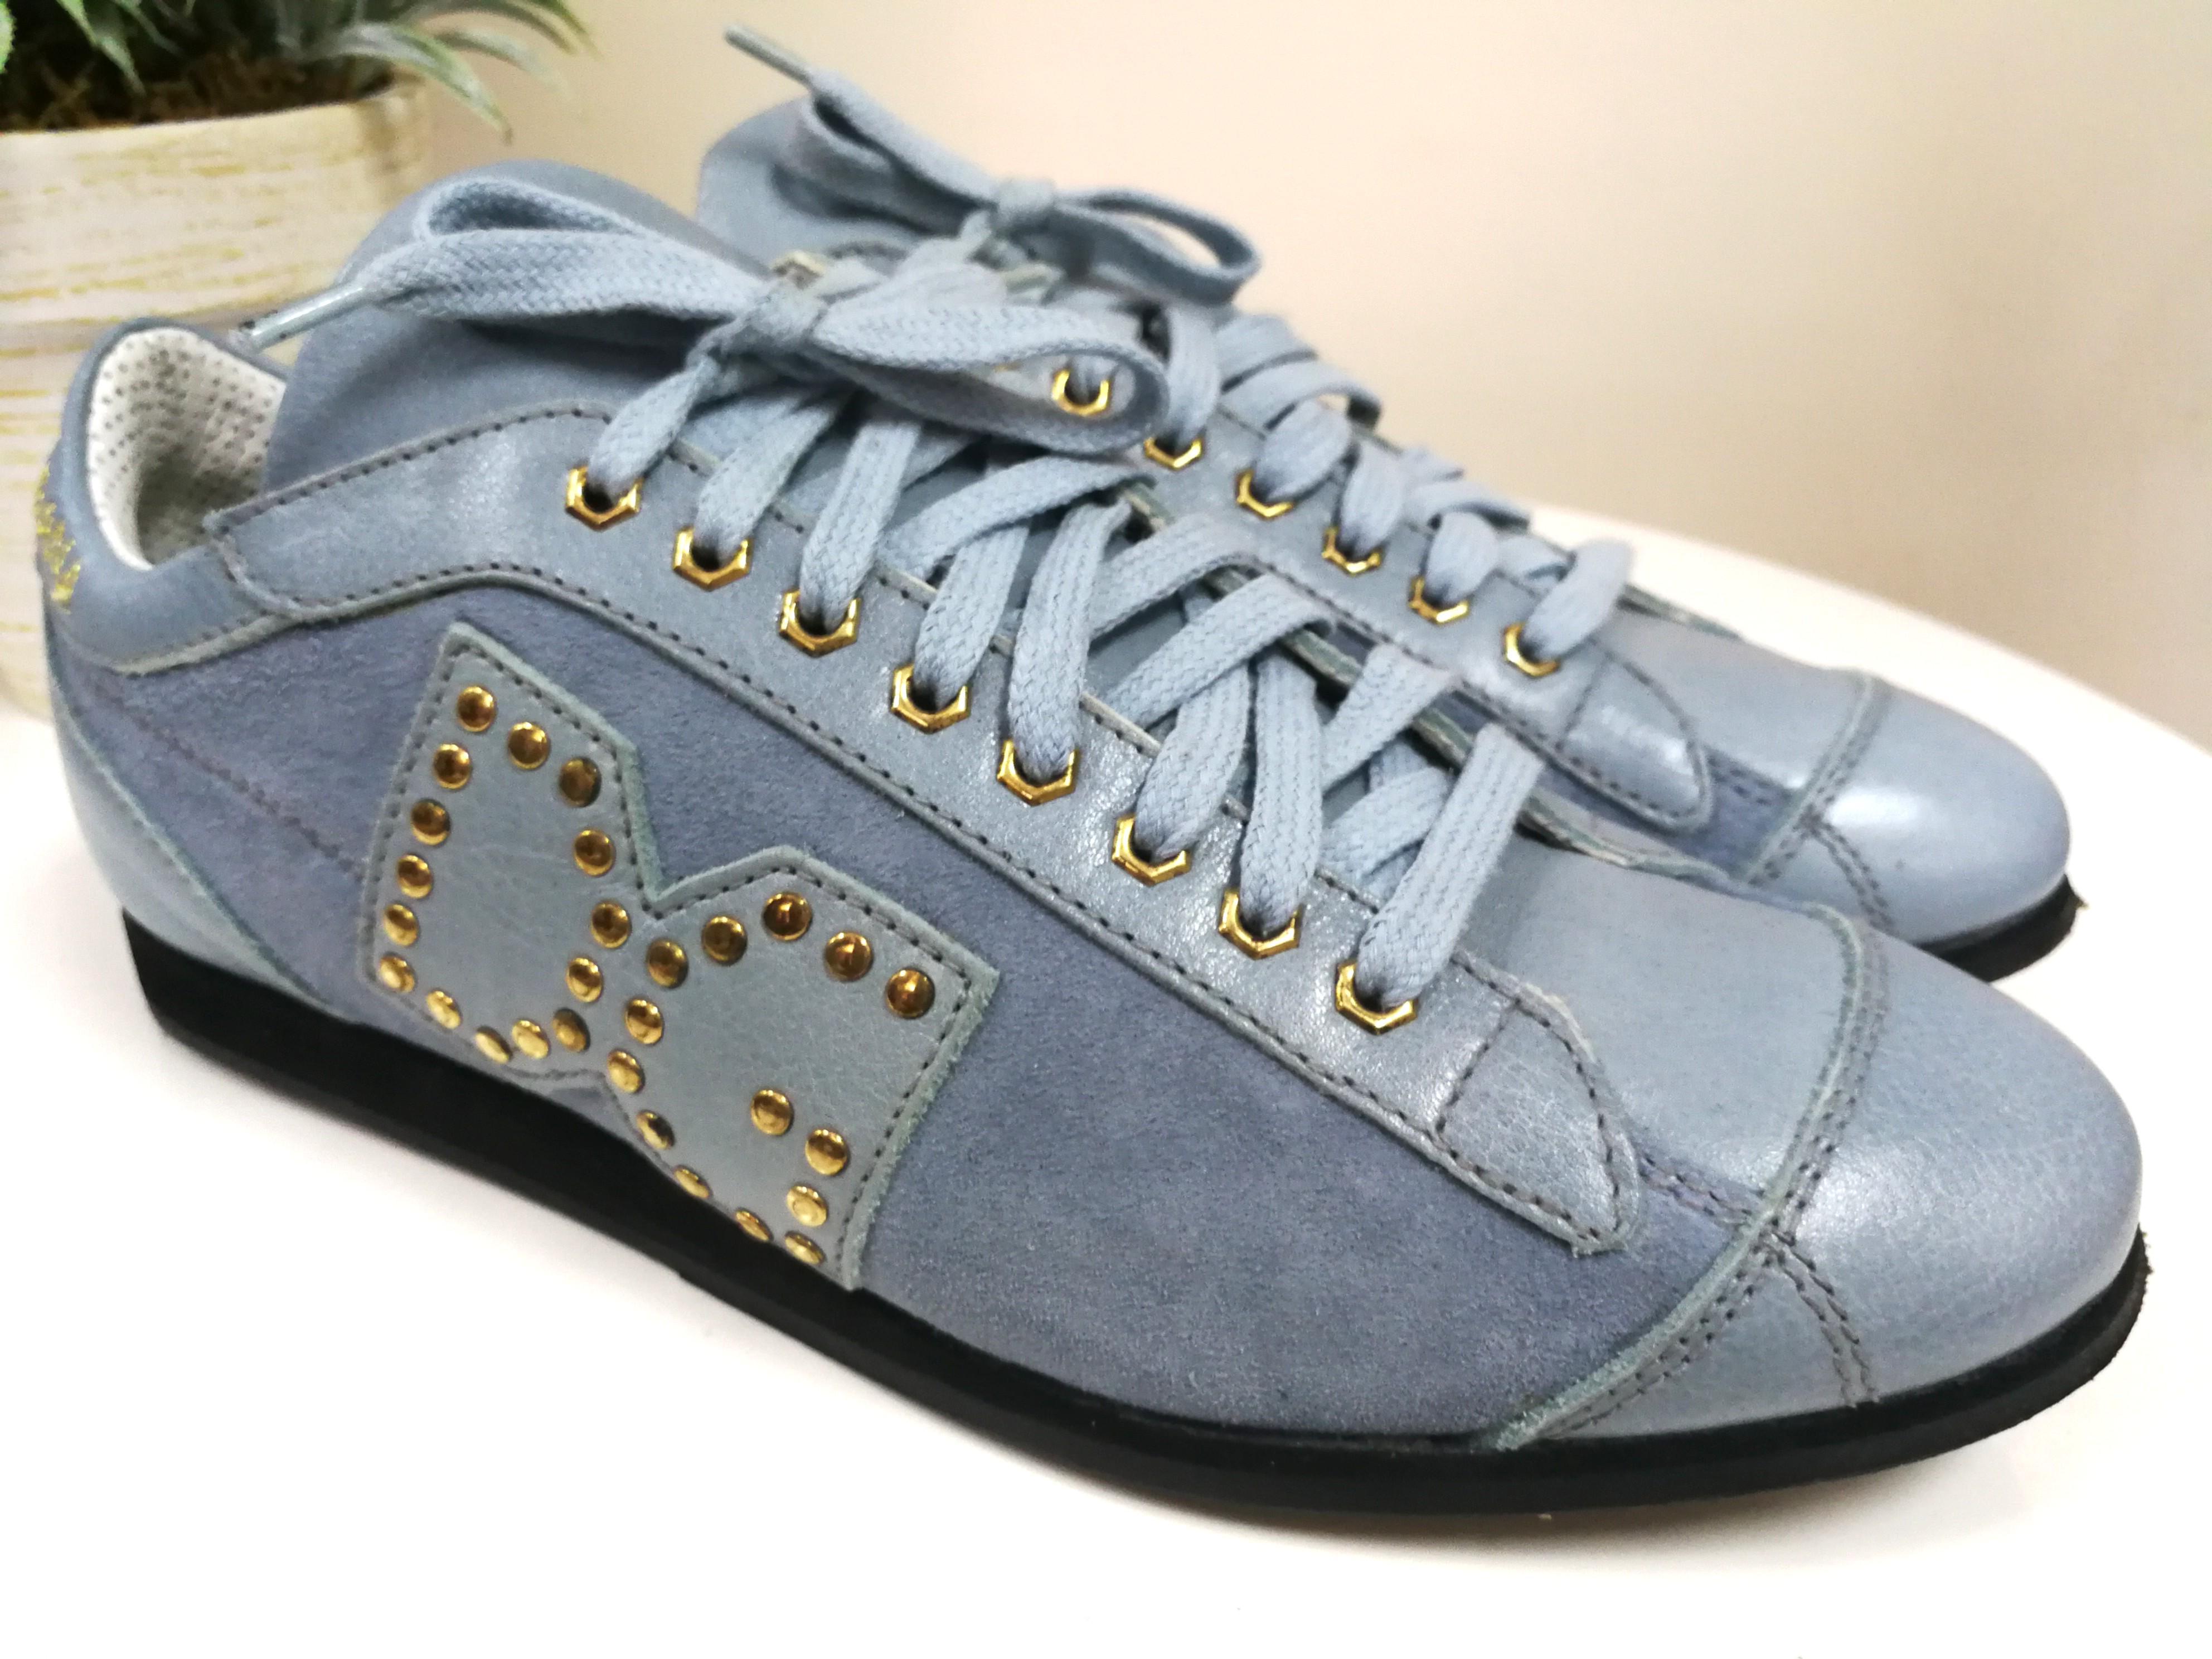 2hand】D\u0026G leather sneaker 波鞋運動鞋